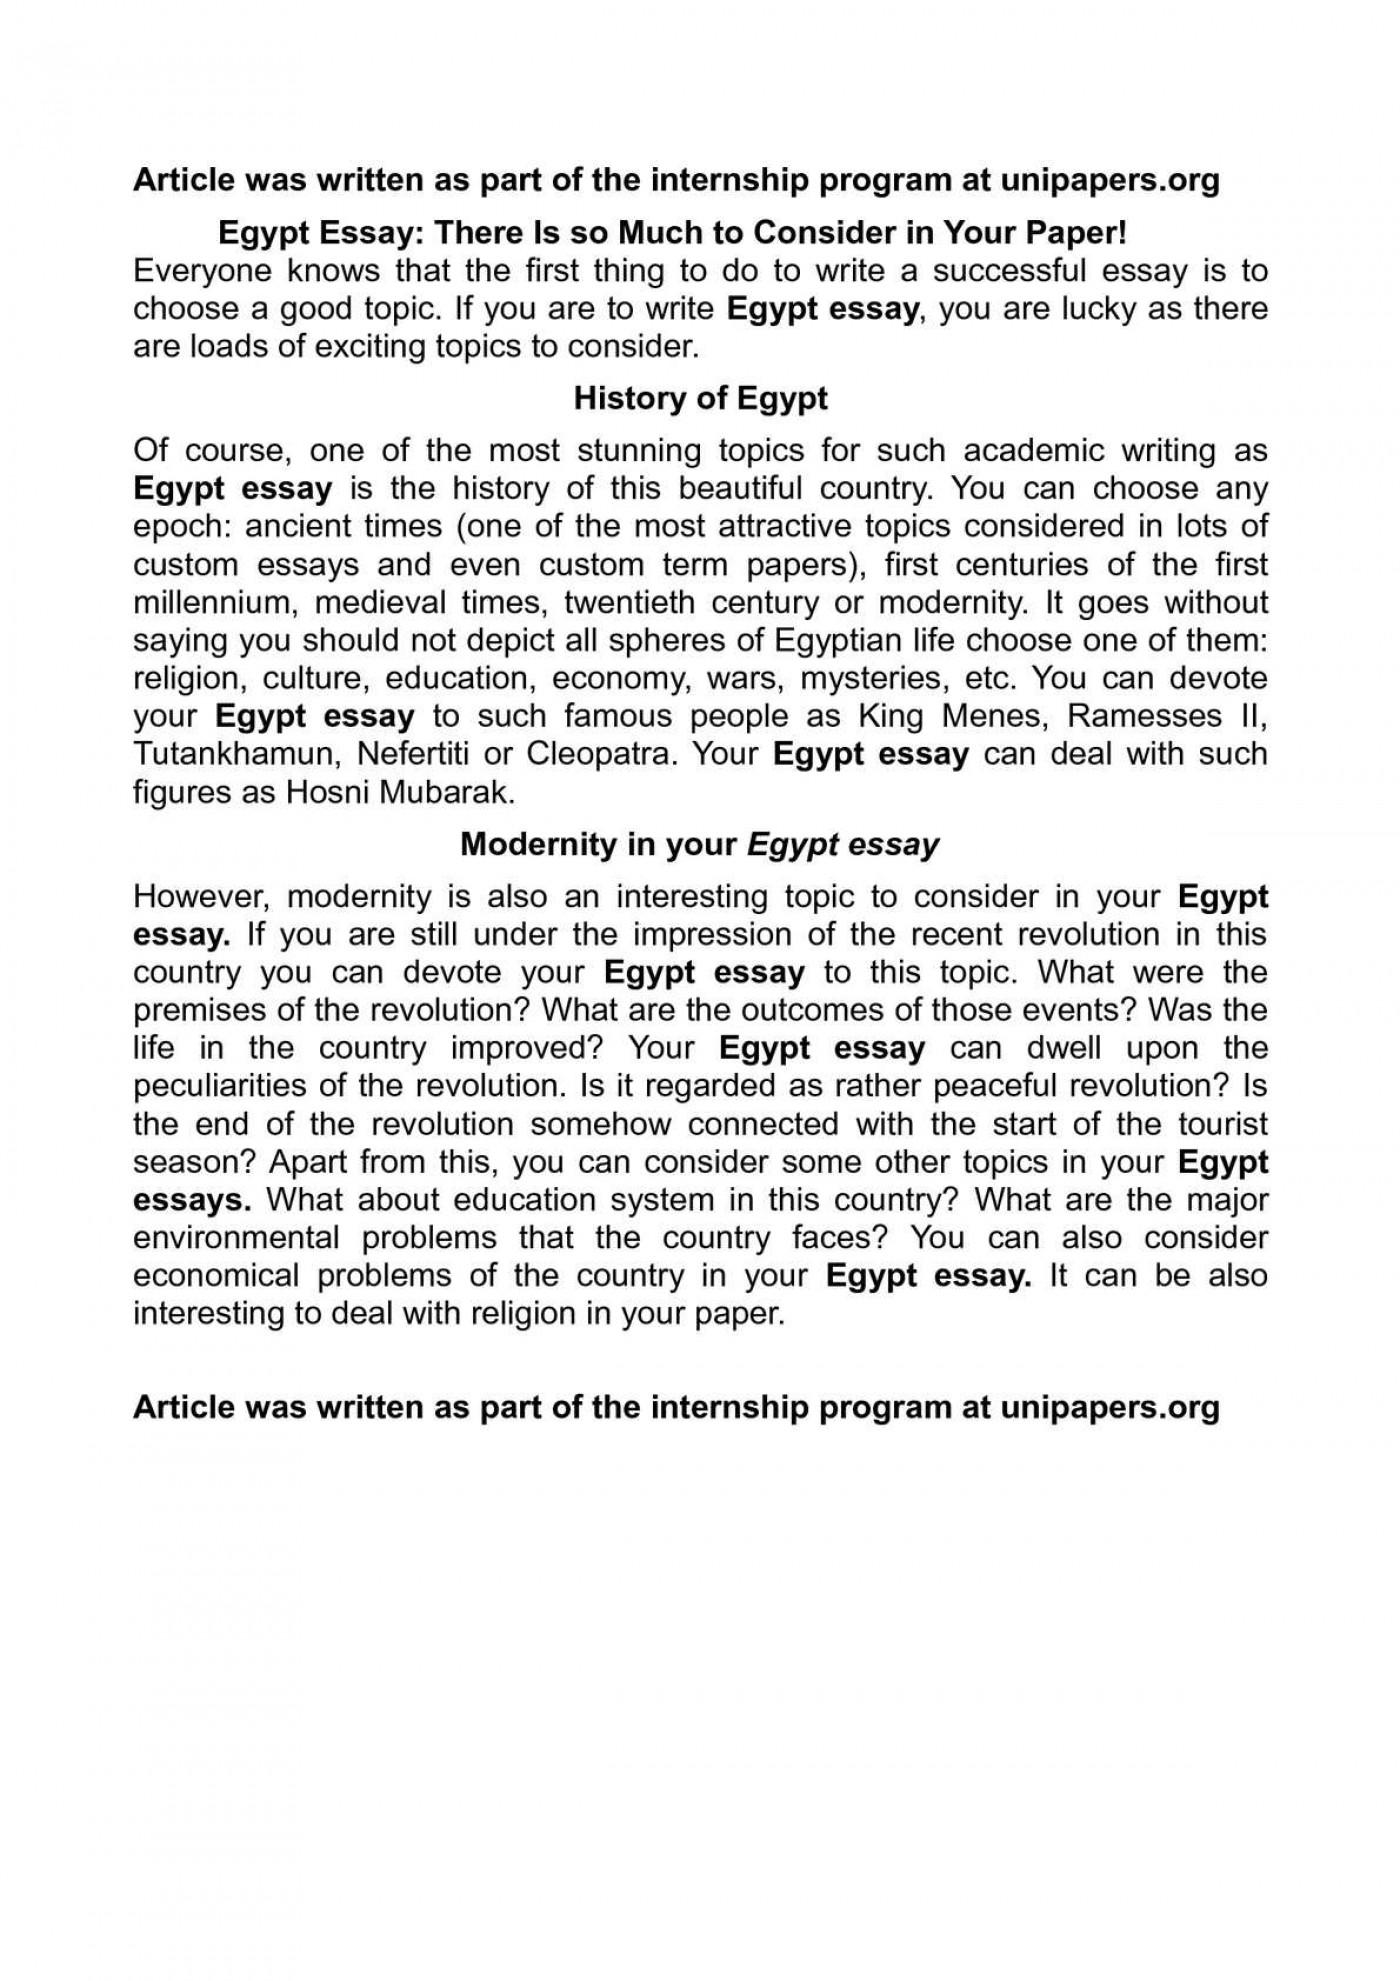 Gun control essay introduction